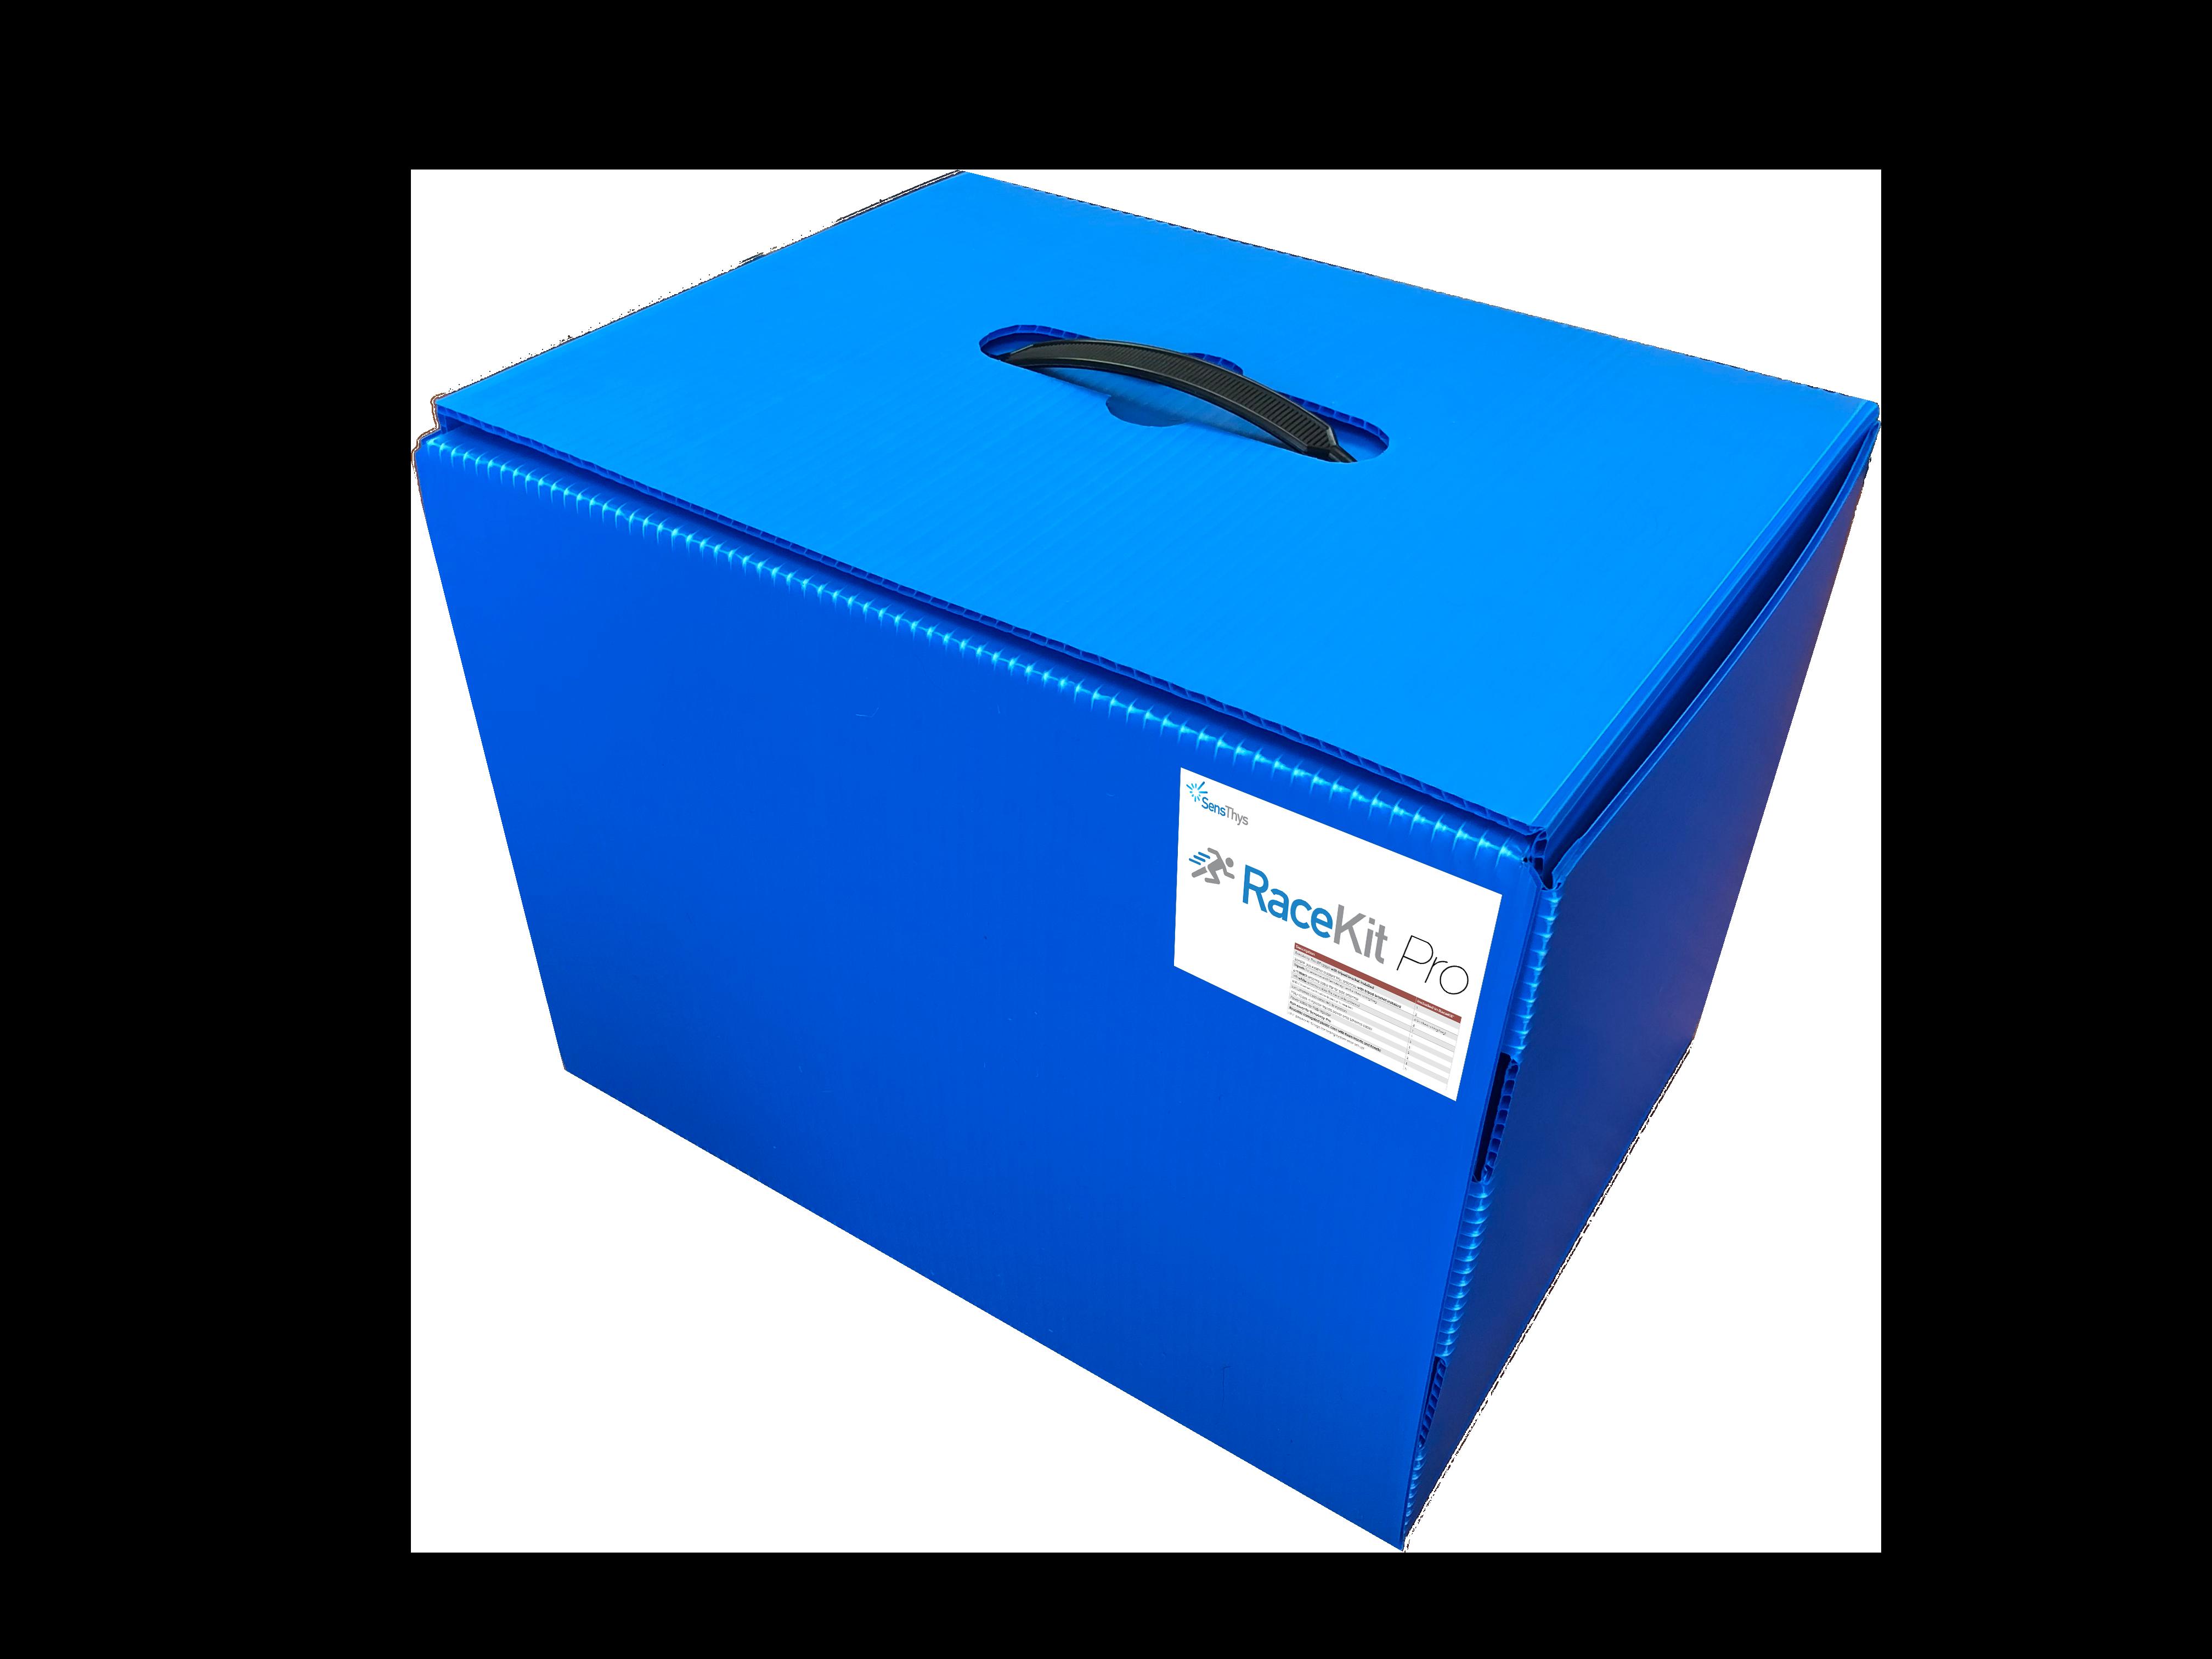 New RaceKit Box